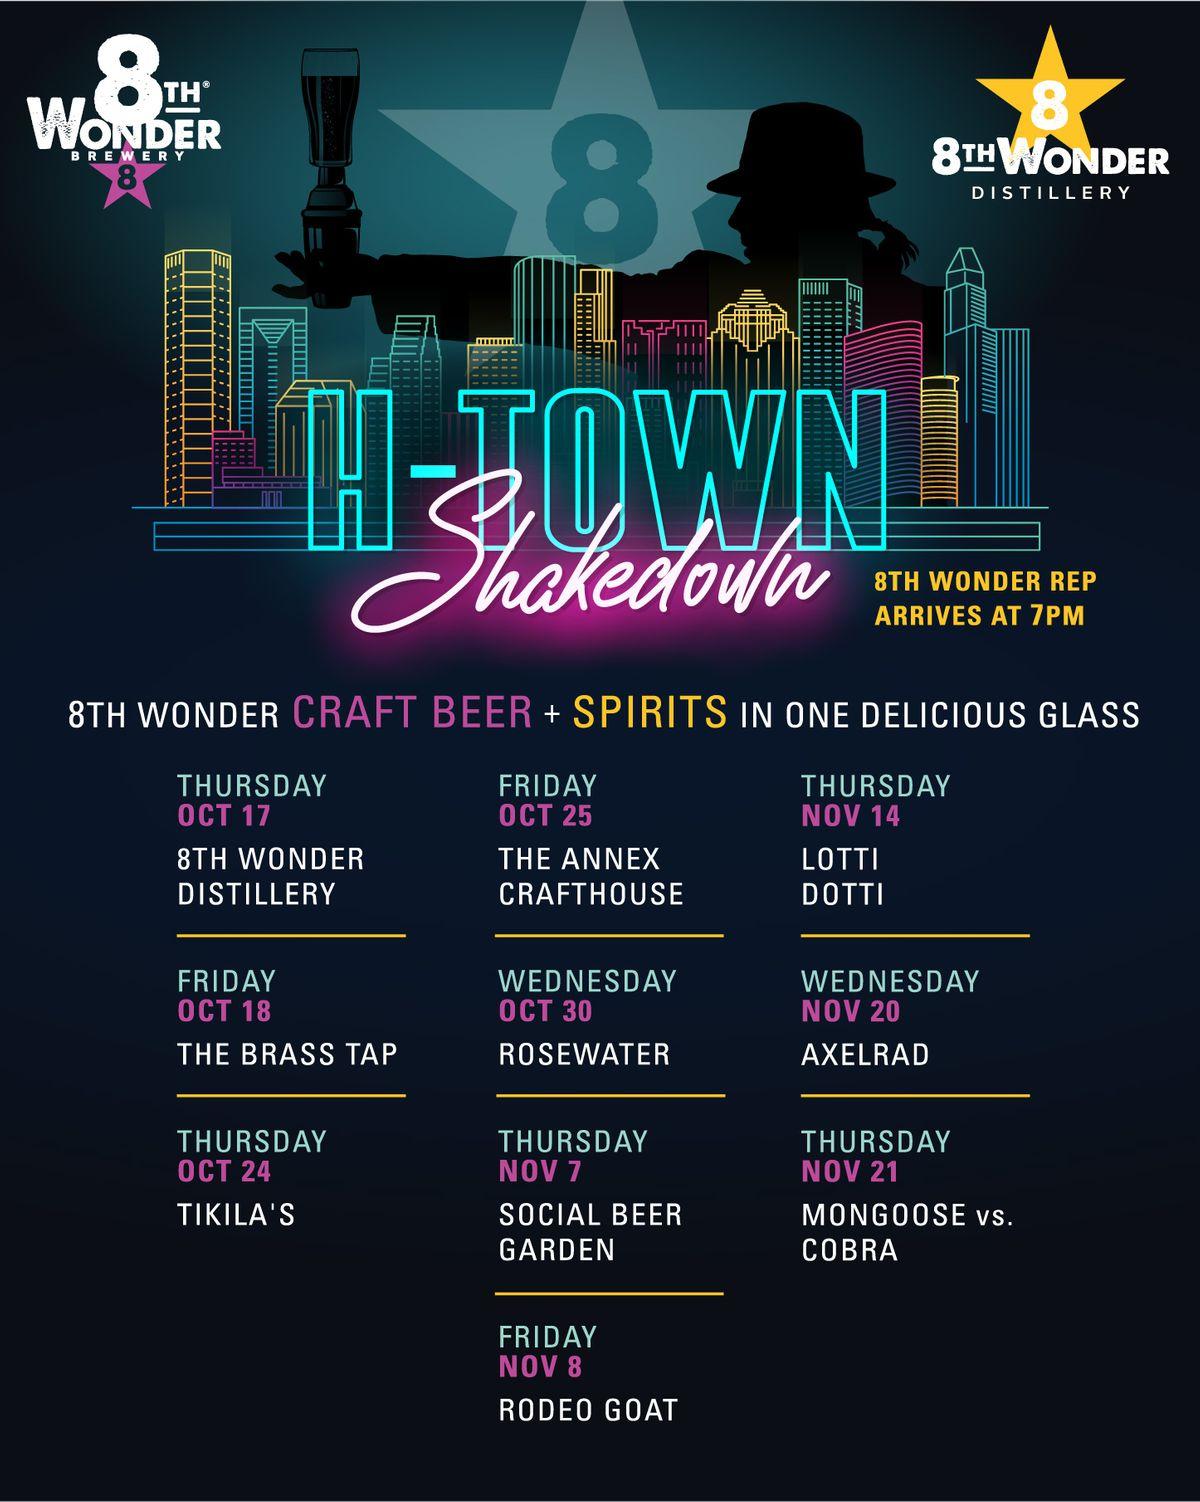 8W_HTownShakedown-Fall2019_2-SM-02-02.jpg